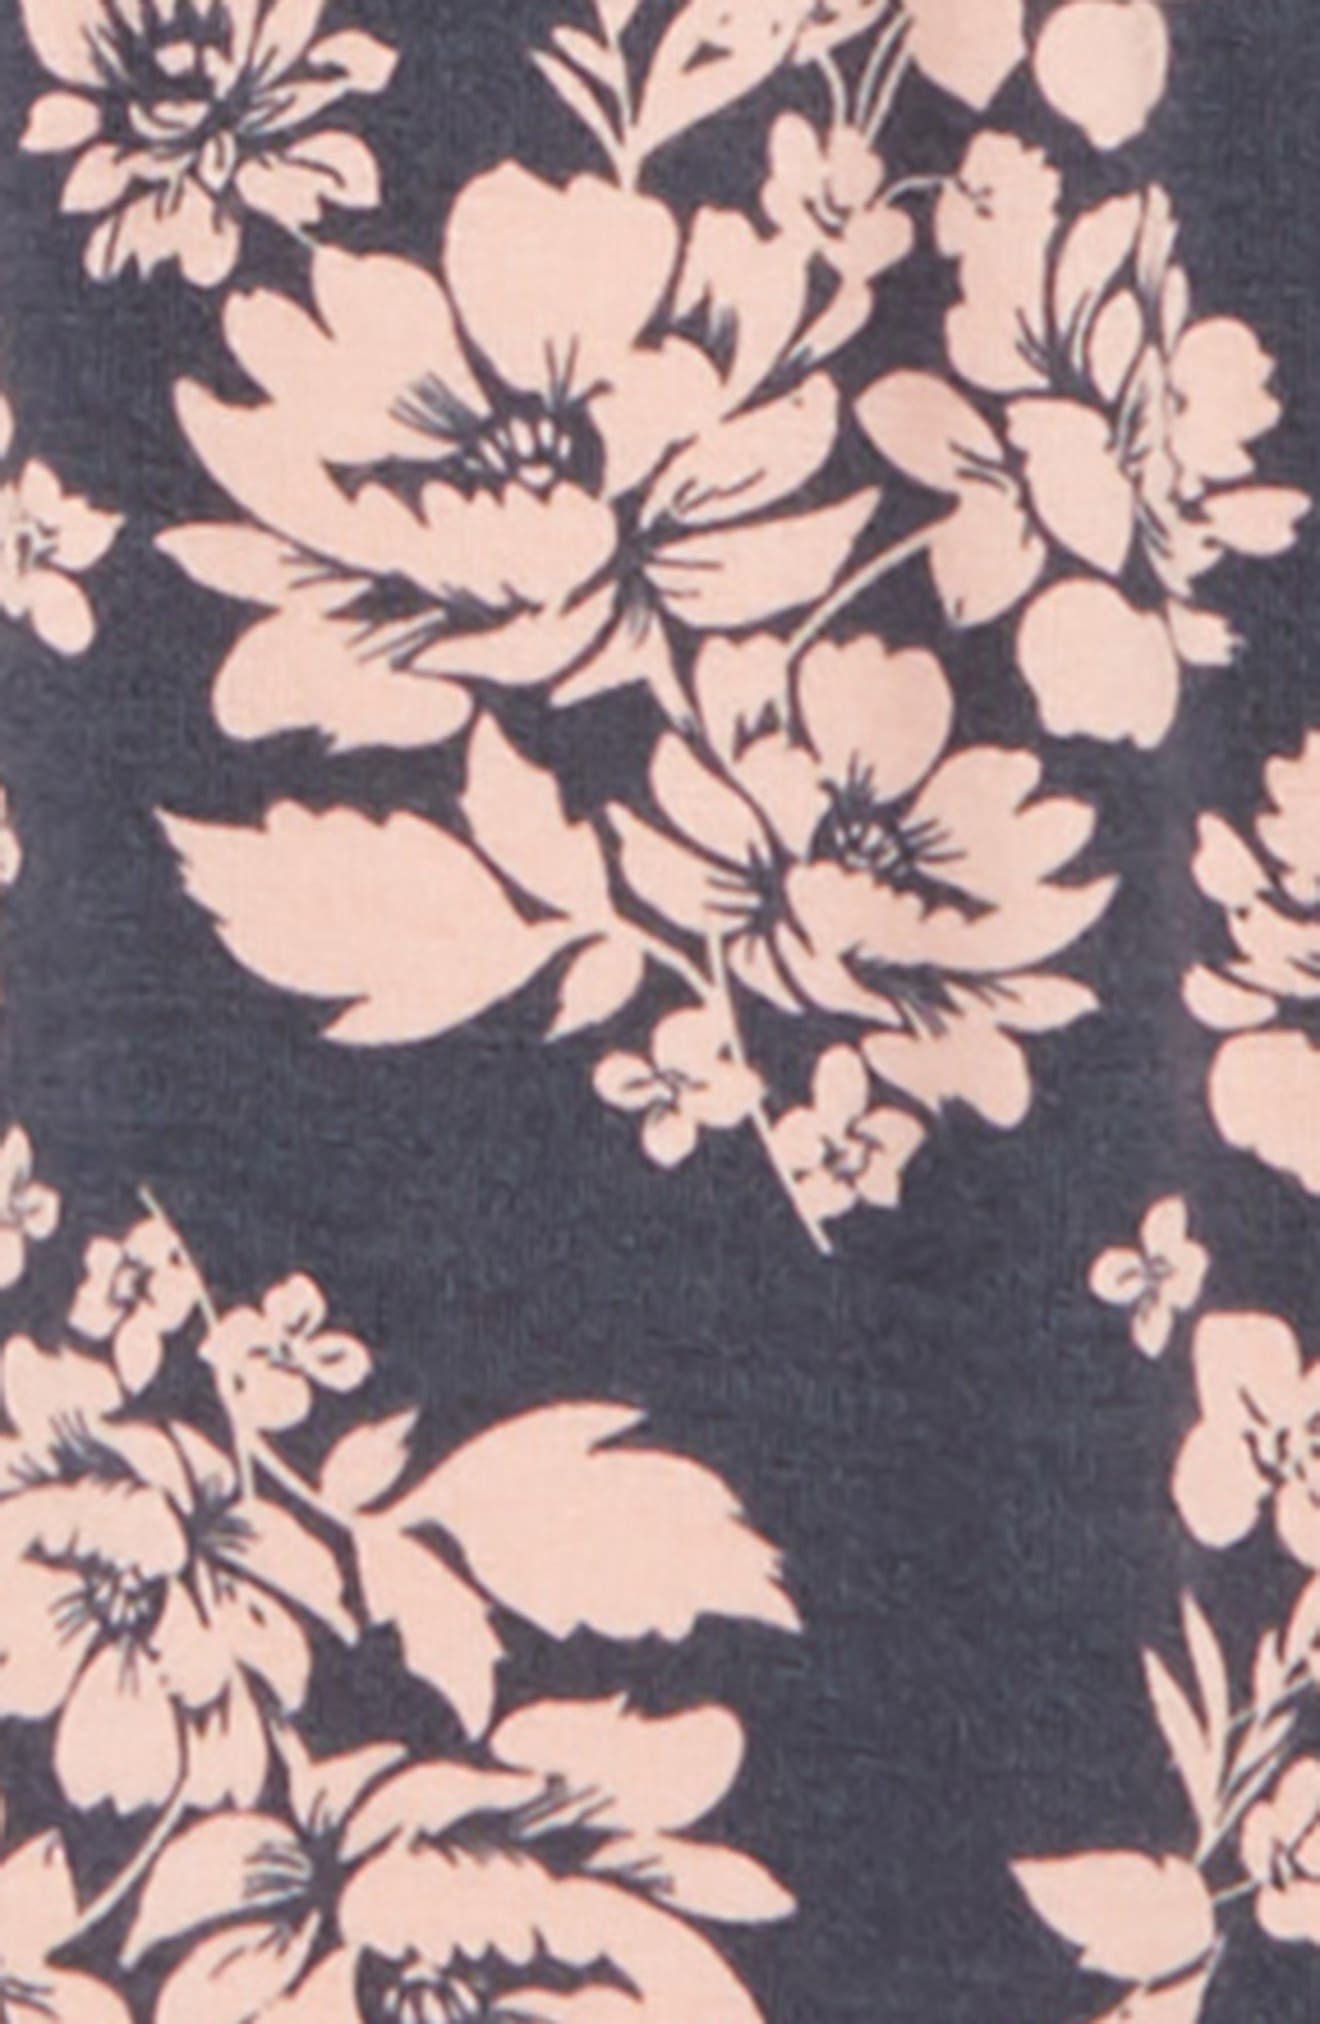 Tunic & Floral Leggings Set,                             Alternate thumbnail 2, color,                             650